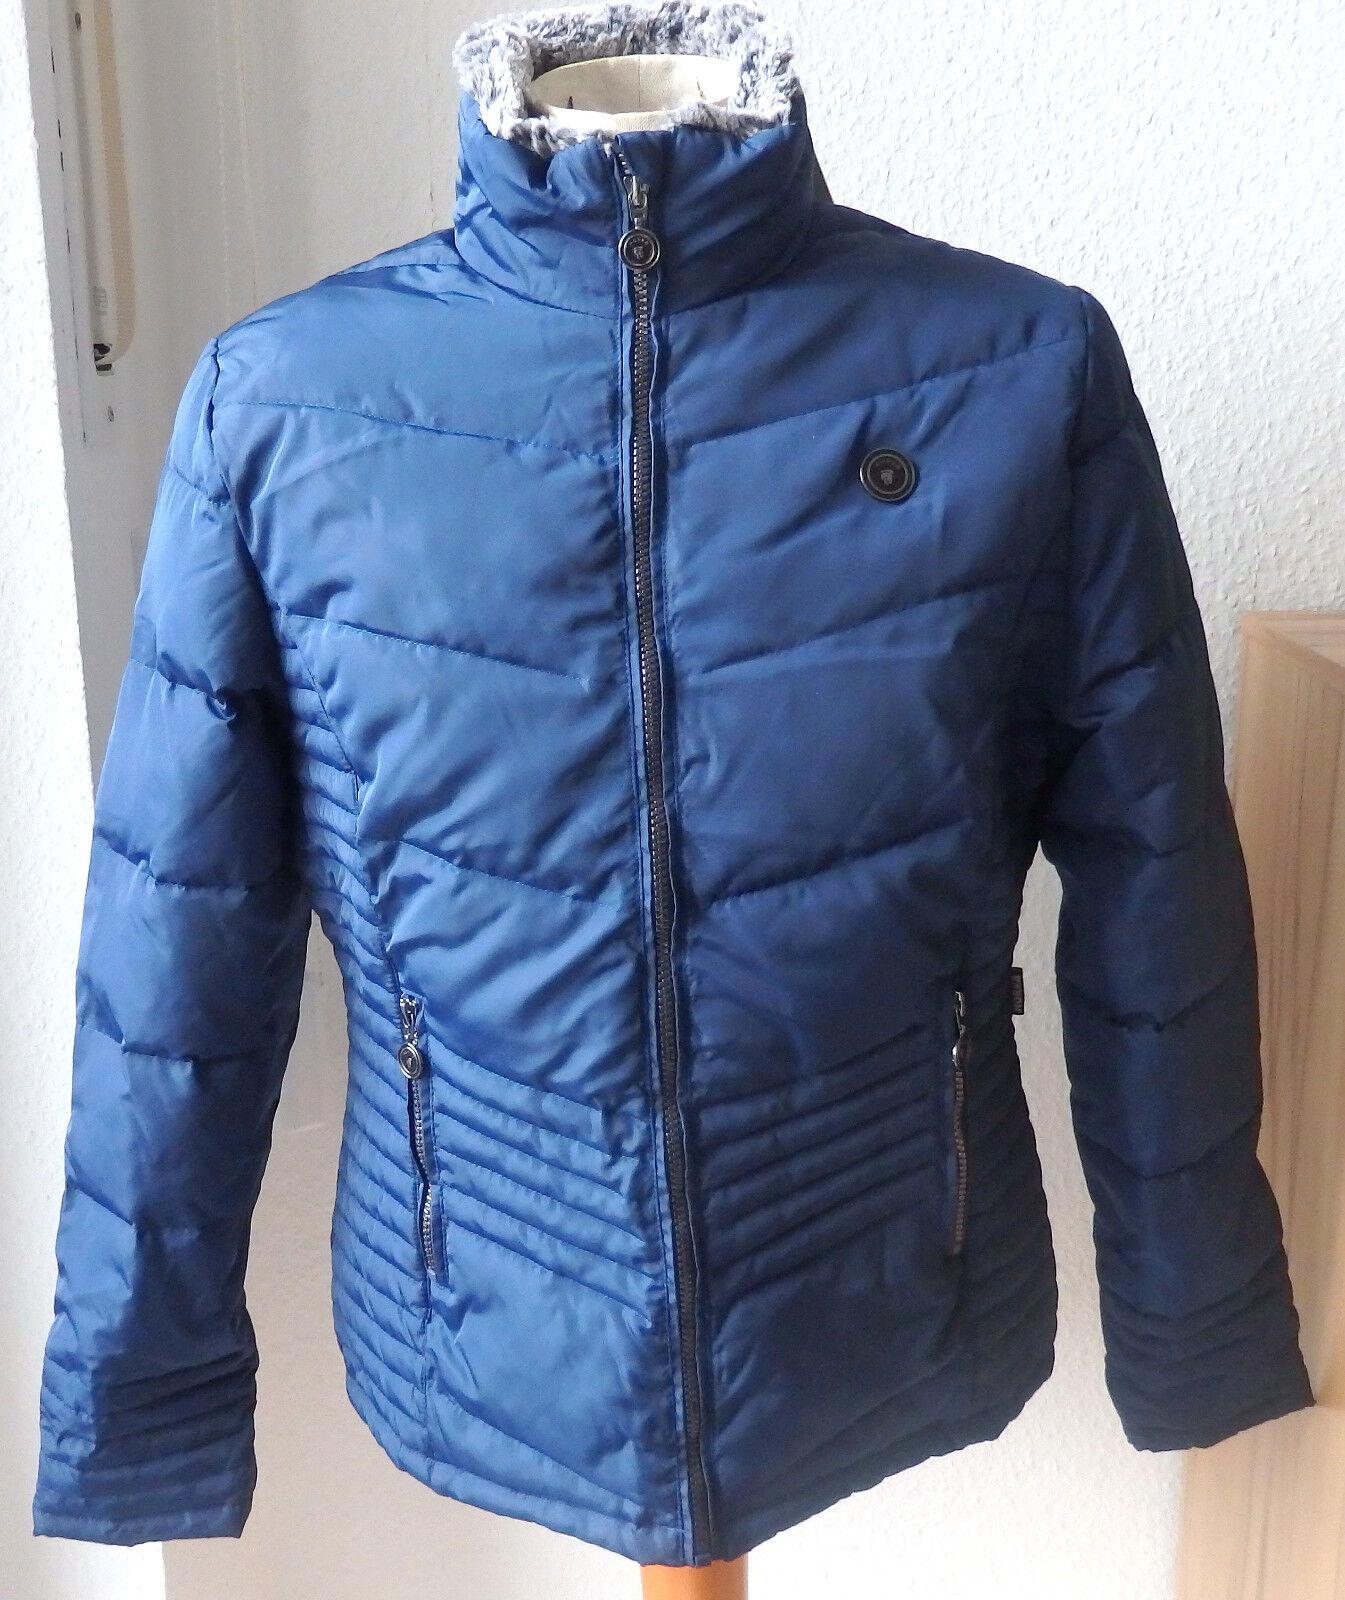 Horka invierno chaqueta señora modelo Zenith, azul, talla s nuevo (22)